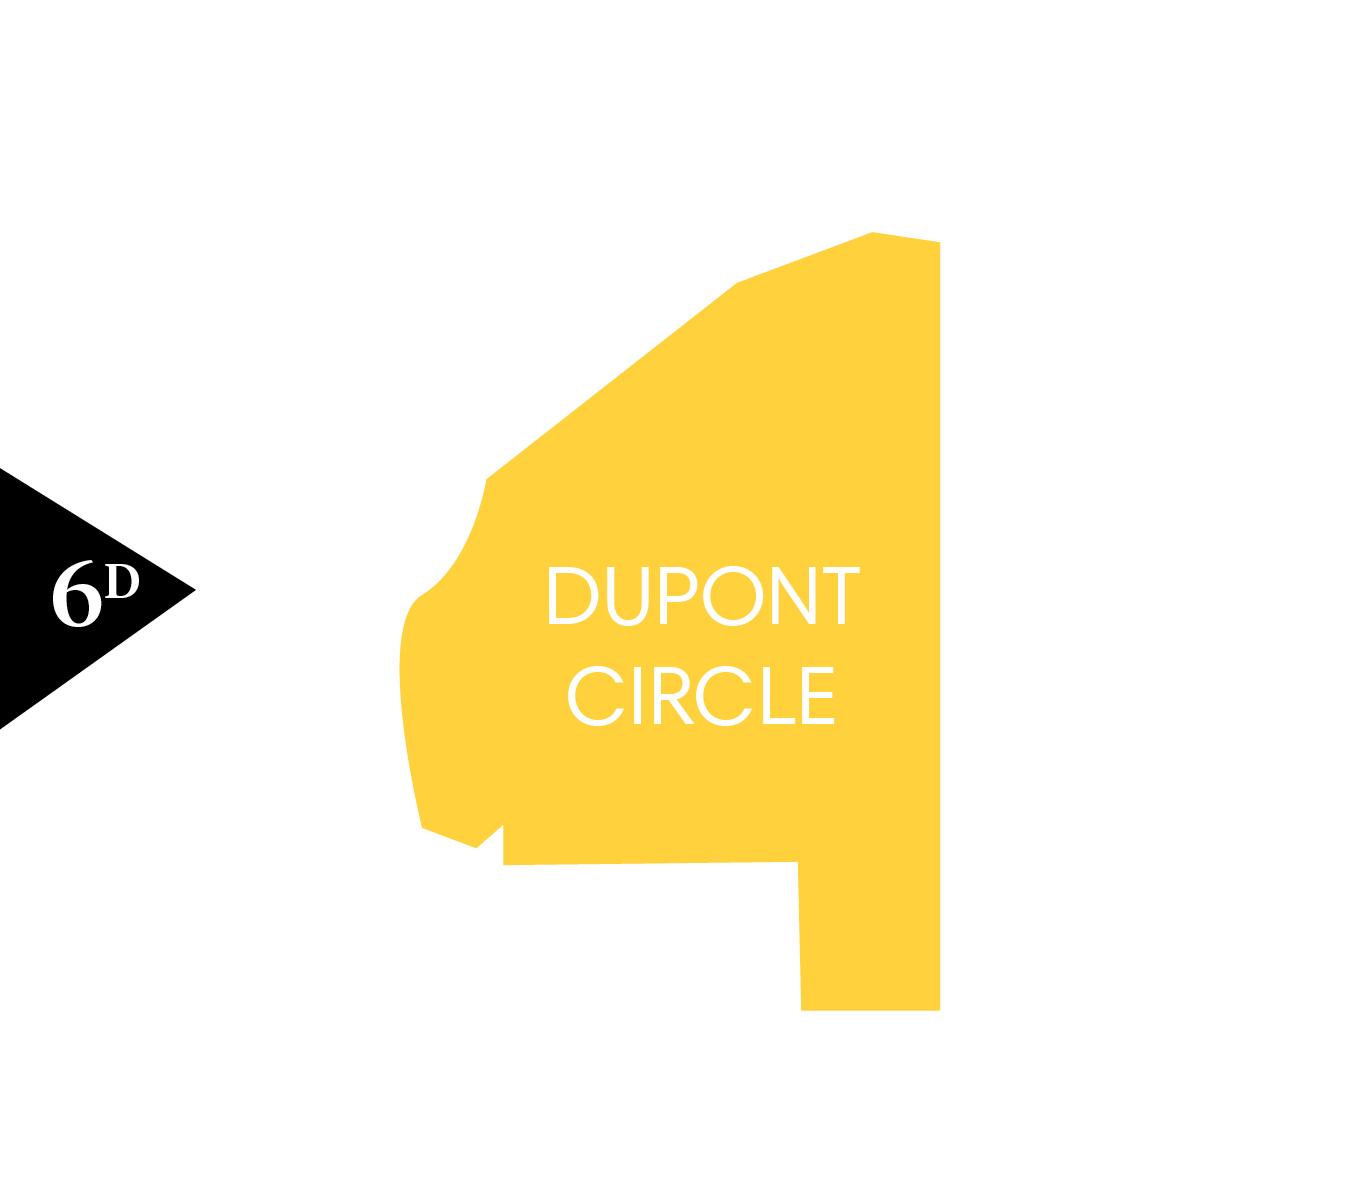 DupontCircle.jpg